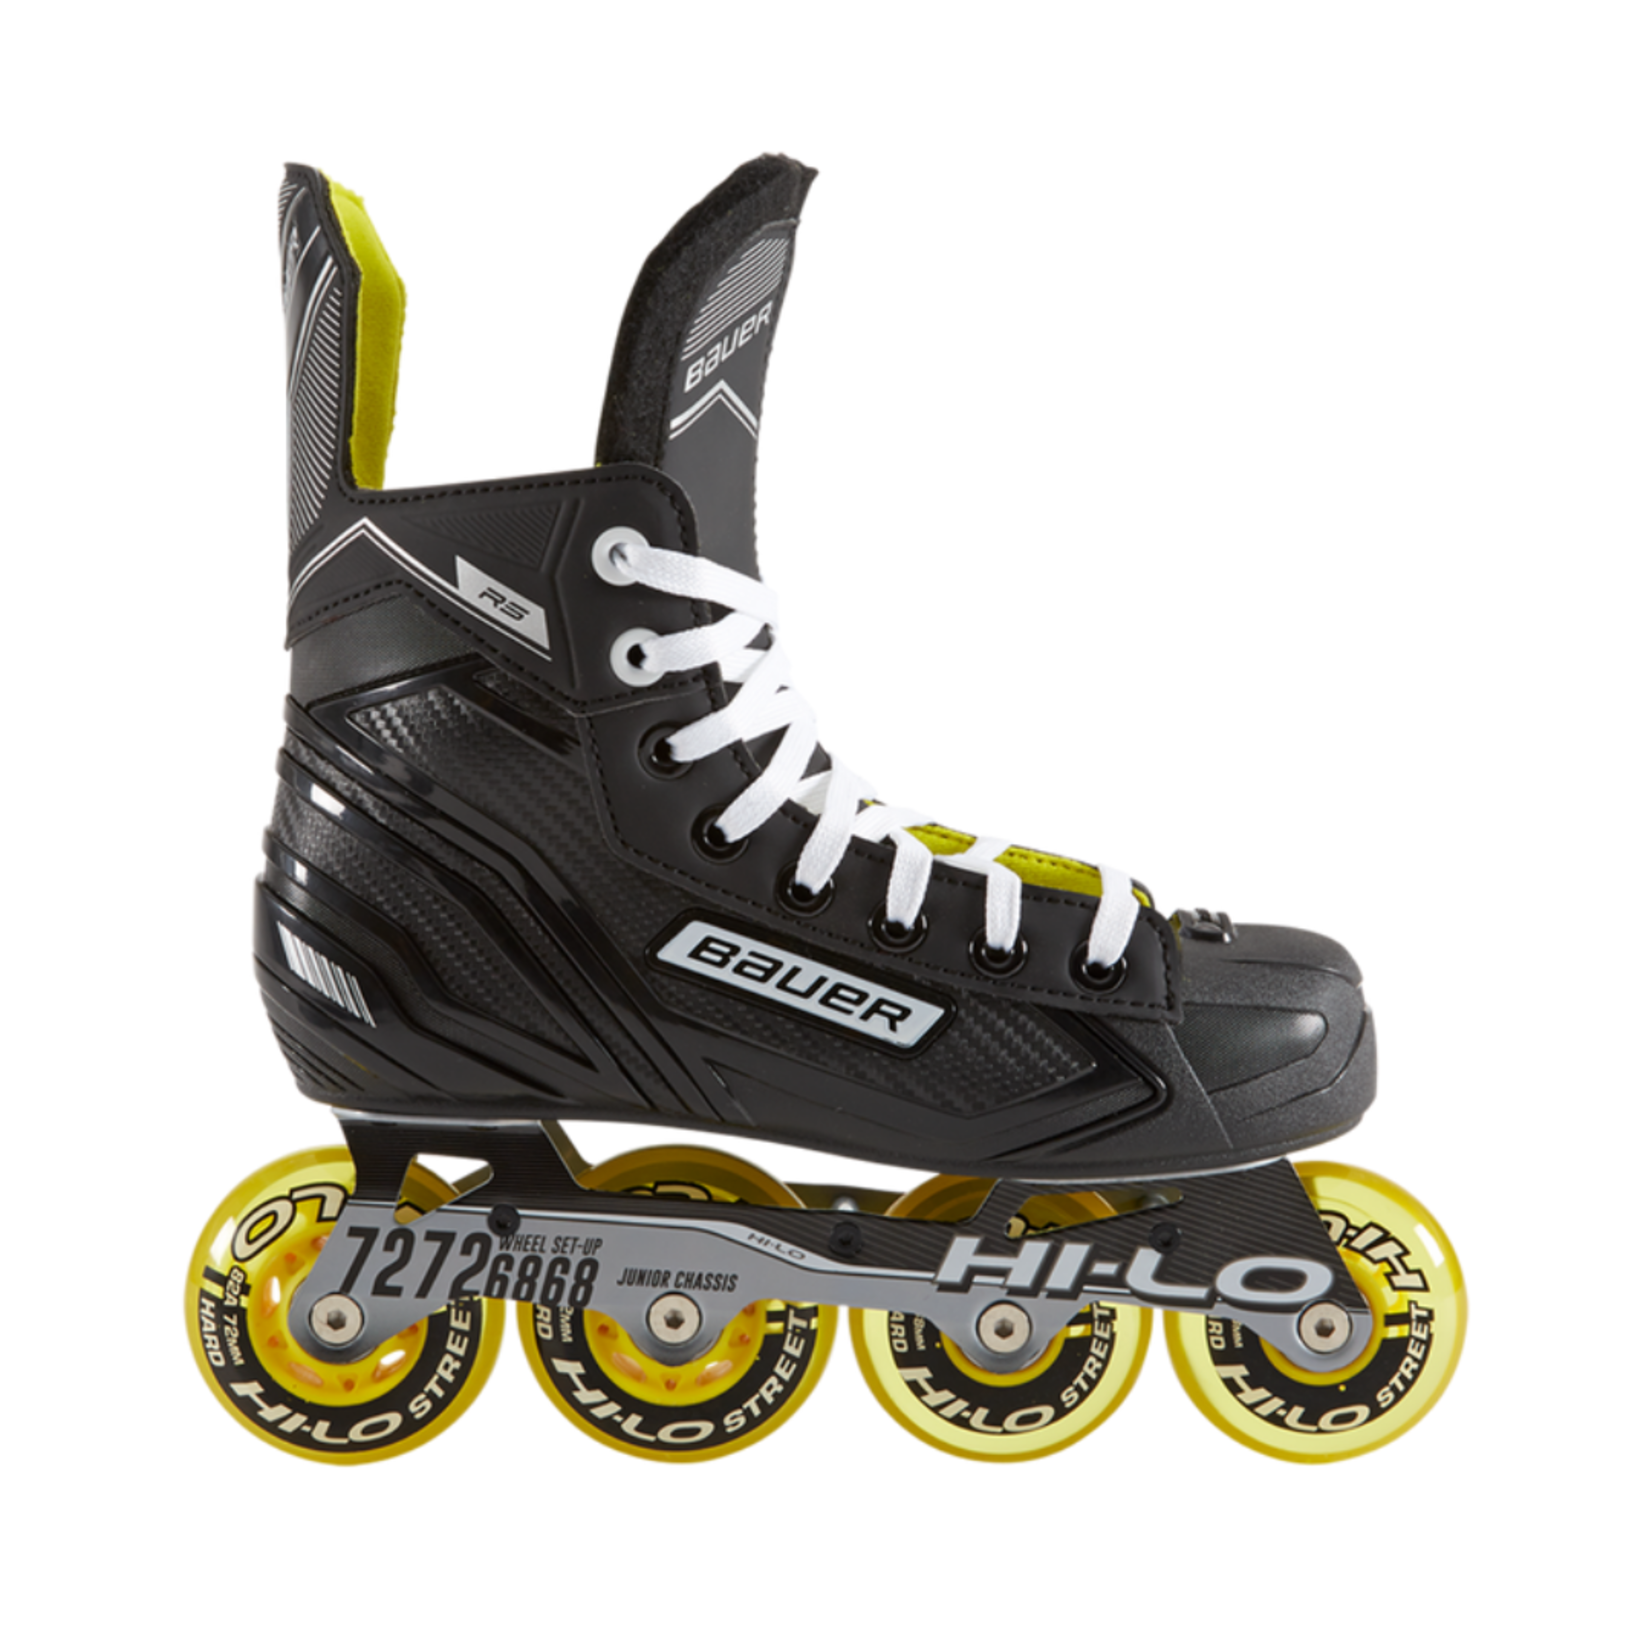 Bauer RH RS Skate Jr